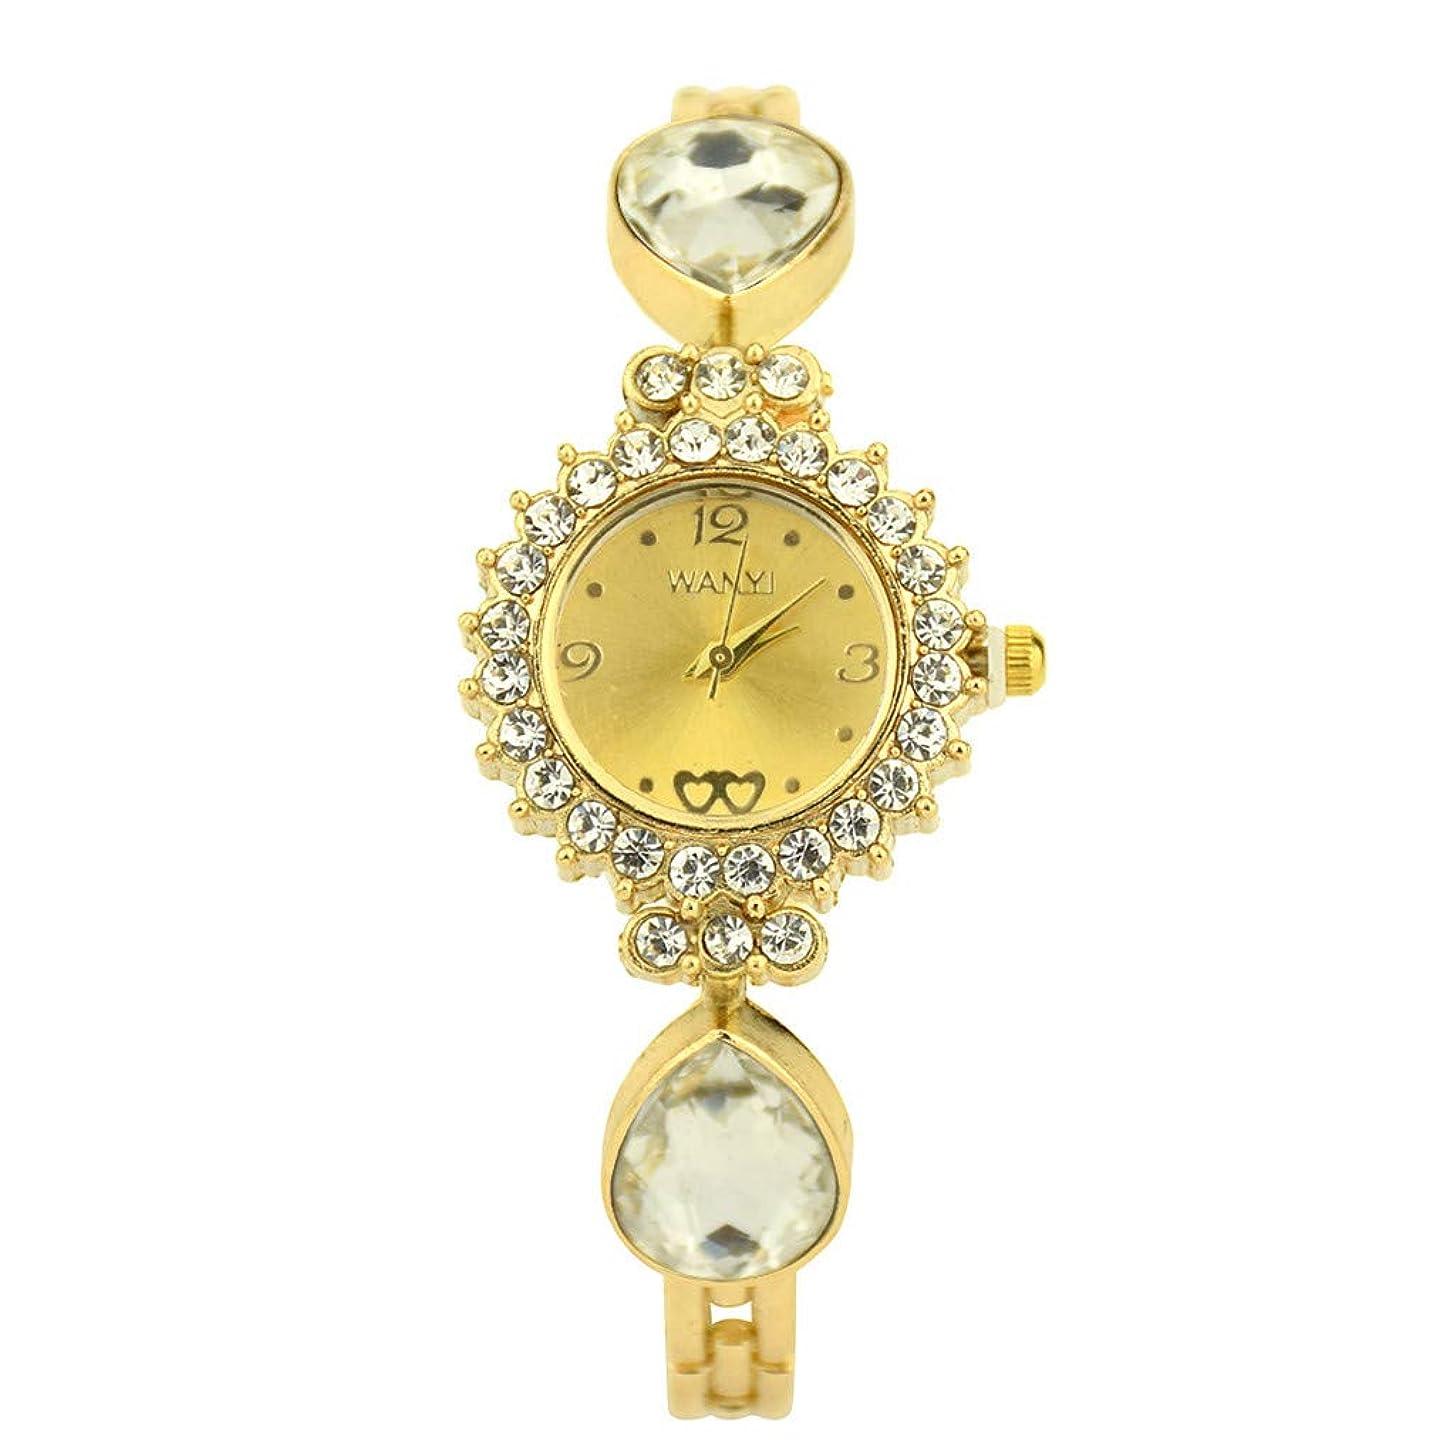 Women's Diamond Bracelet Watch Analog Quartz Sports Watch Watches for Women Simple Under 5 ? Best Gifts for Lovers